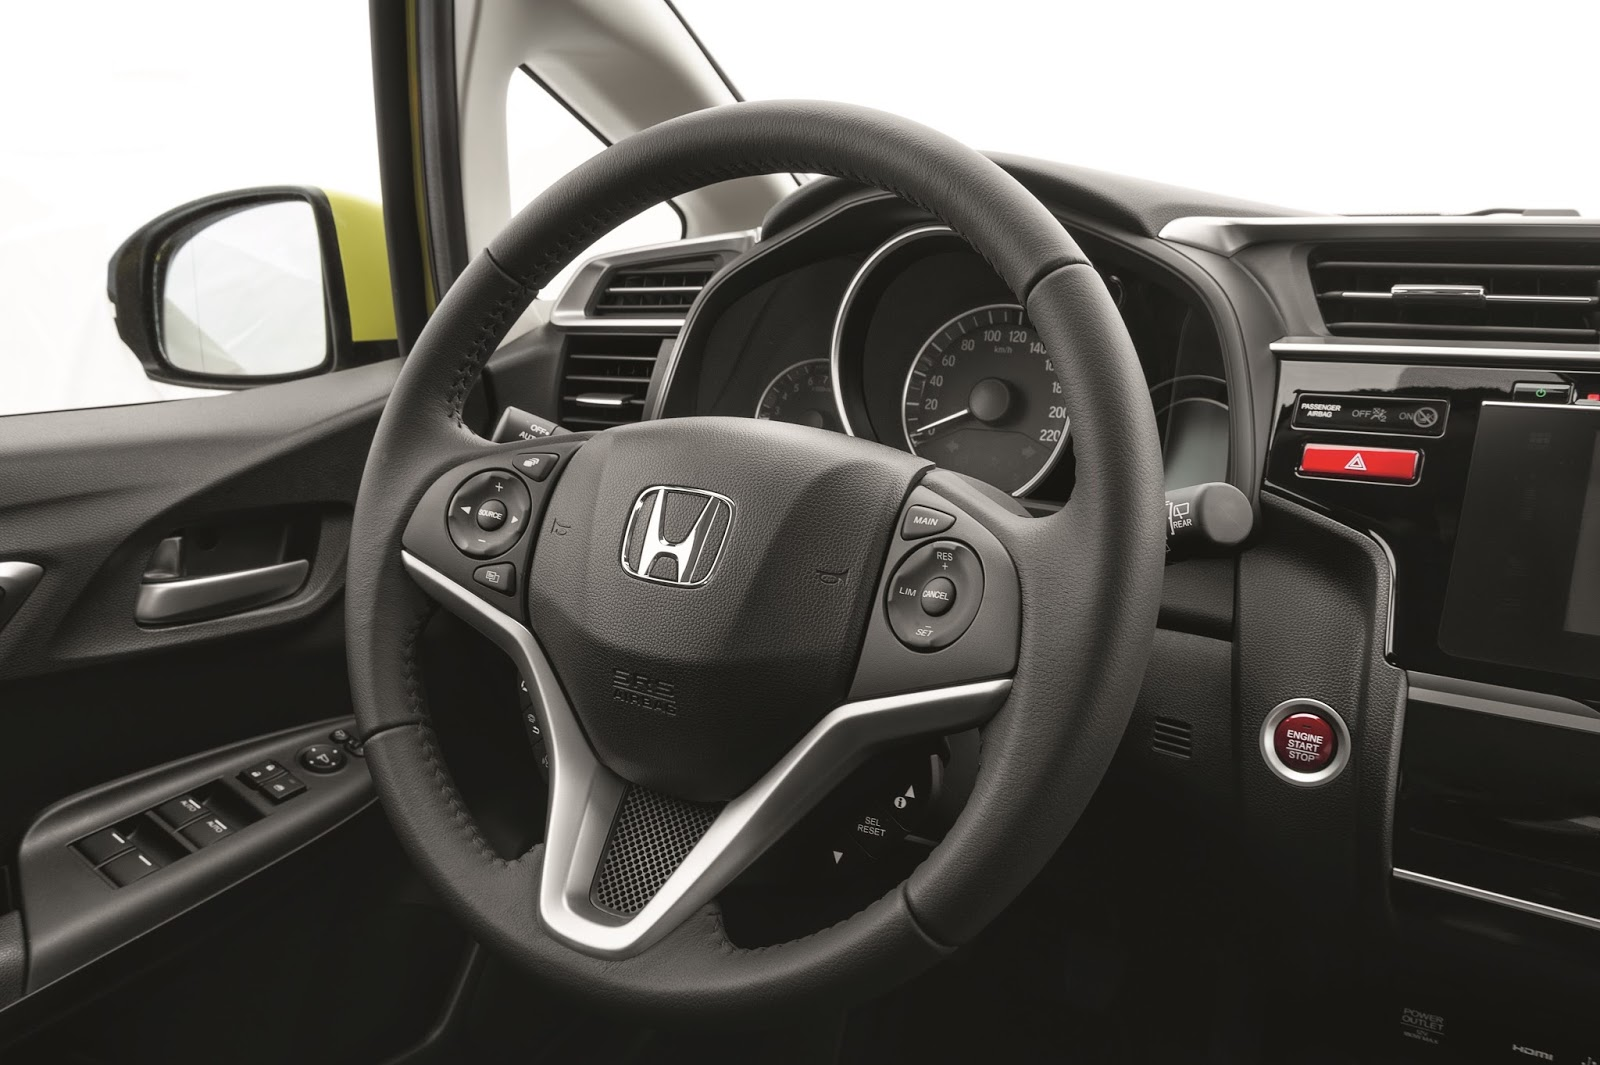 58079 2015 Honda Jazz Η τρίτη γενιά του Honda Jazz ήρθε ακόμα πιο πρακτική και «εξυπνότερη»